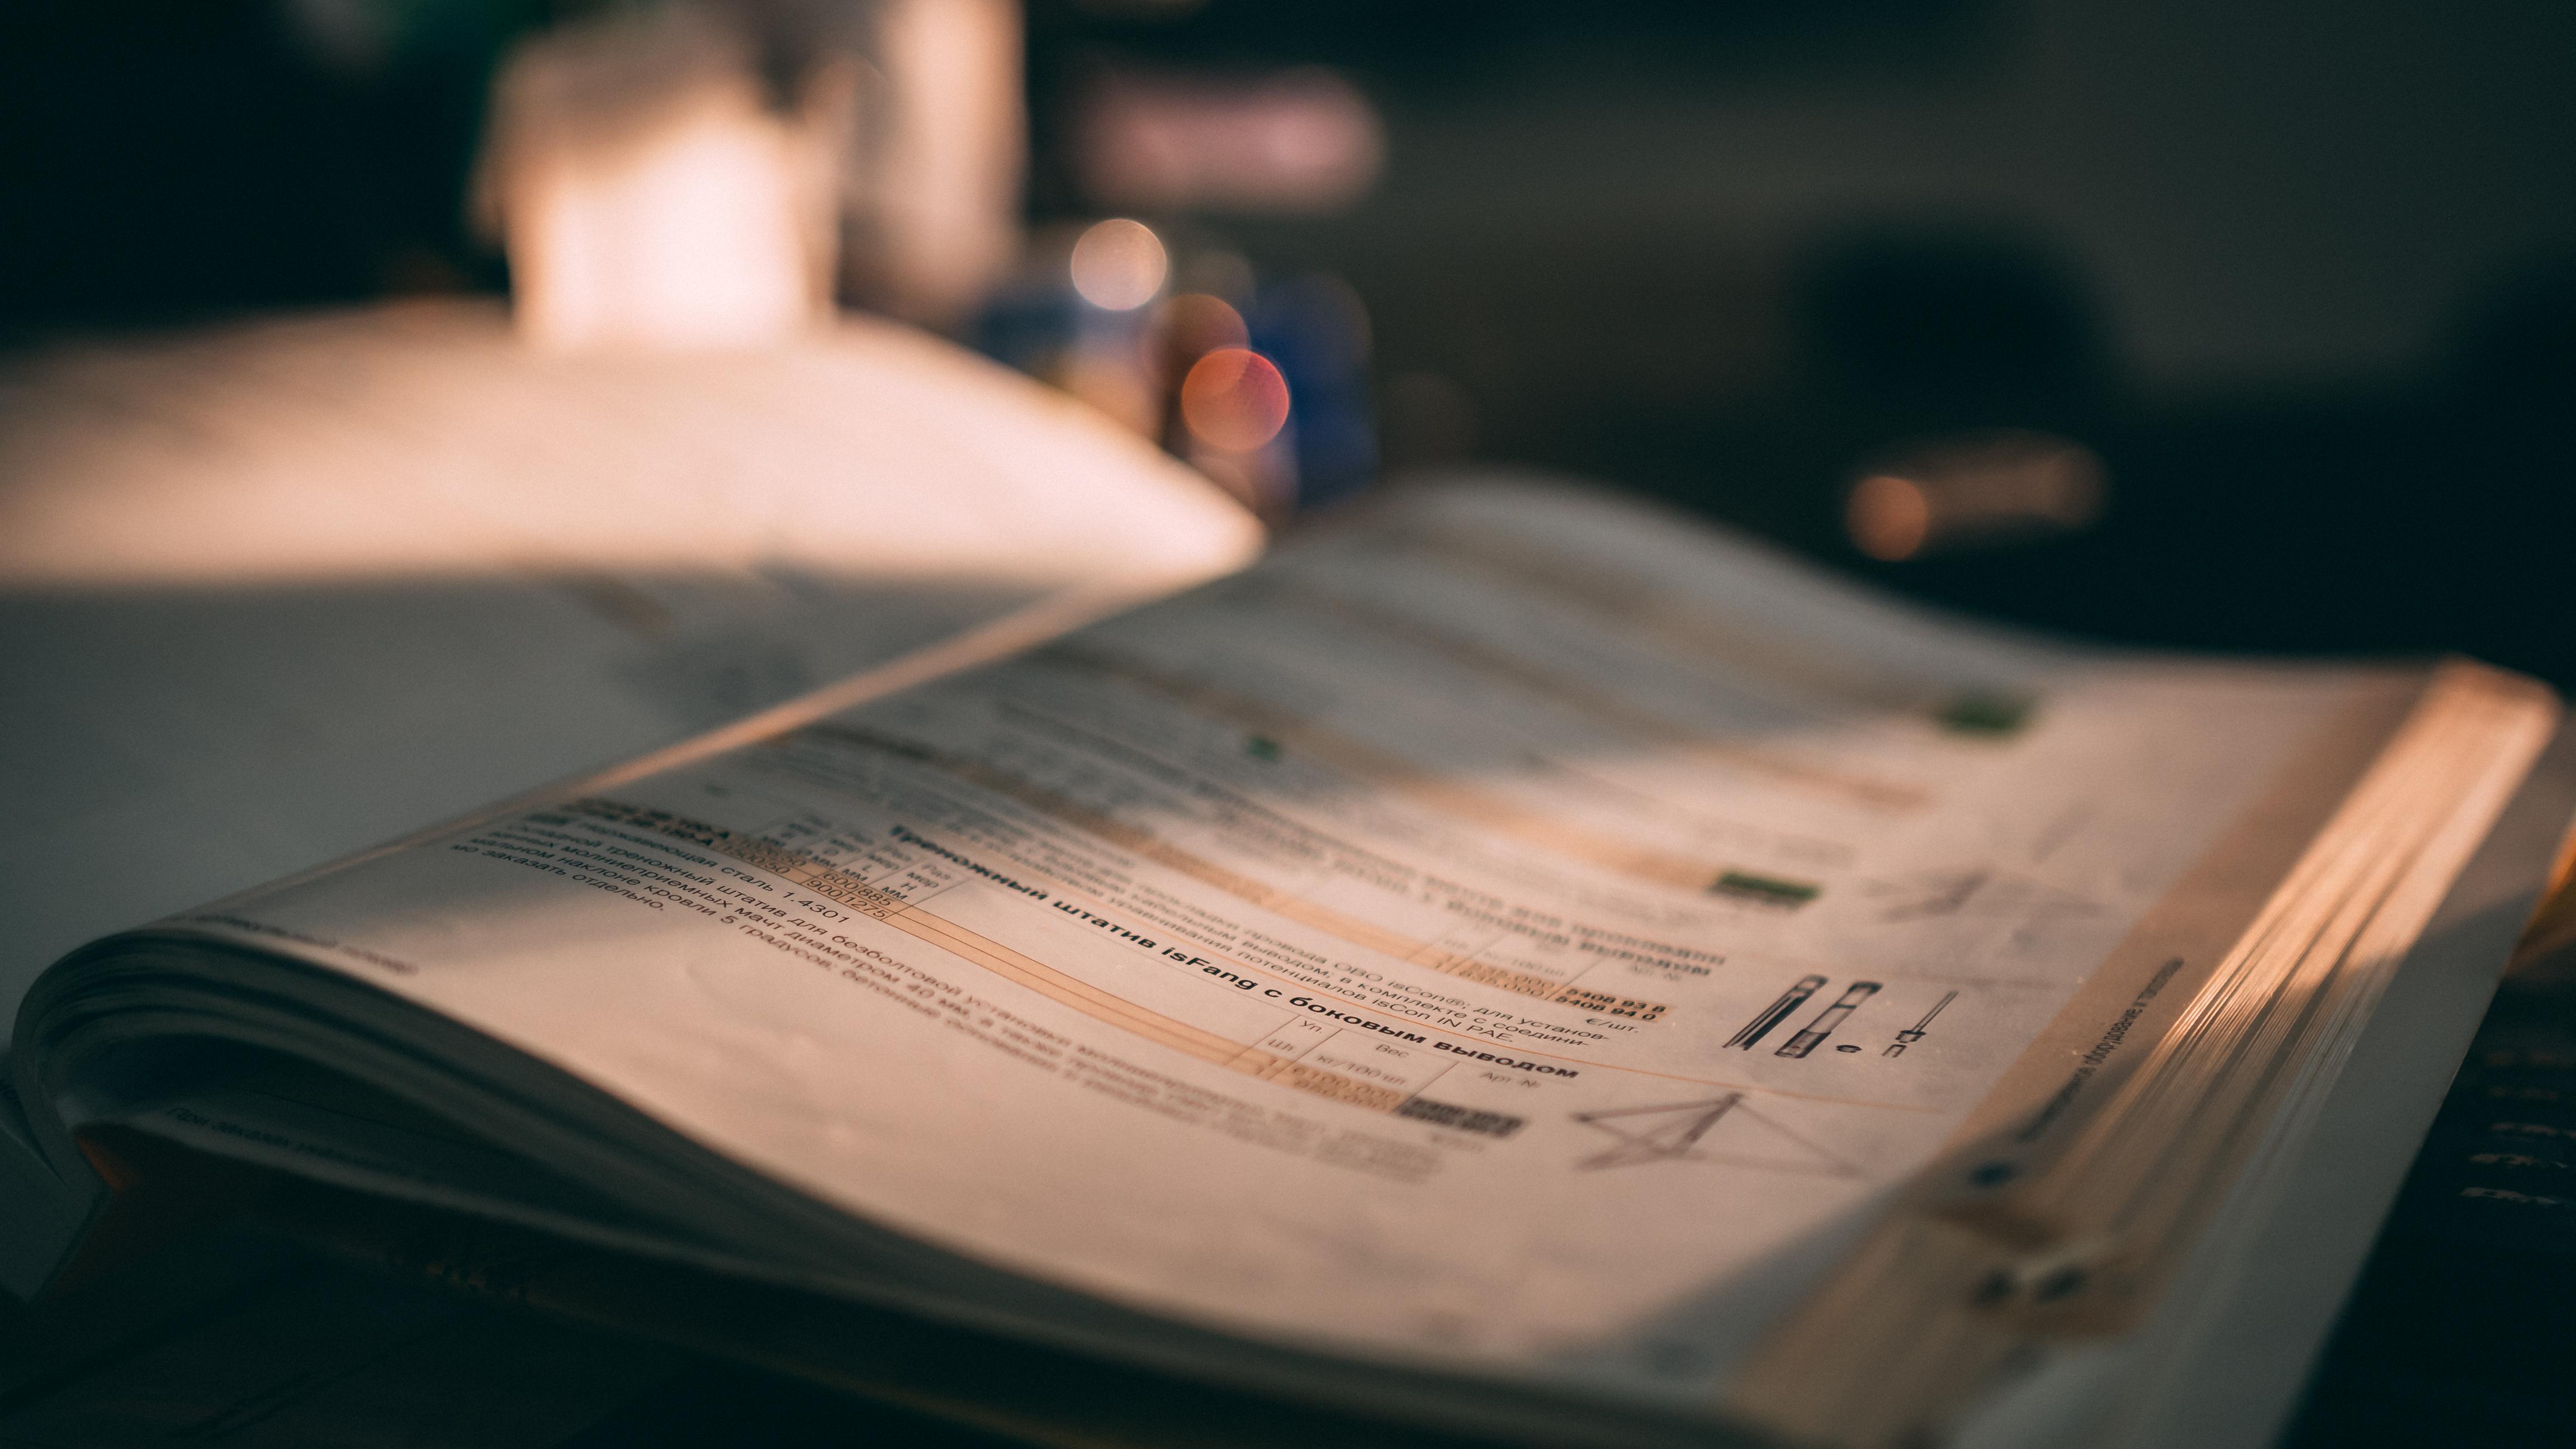 Close-Up Photo Of Book